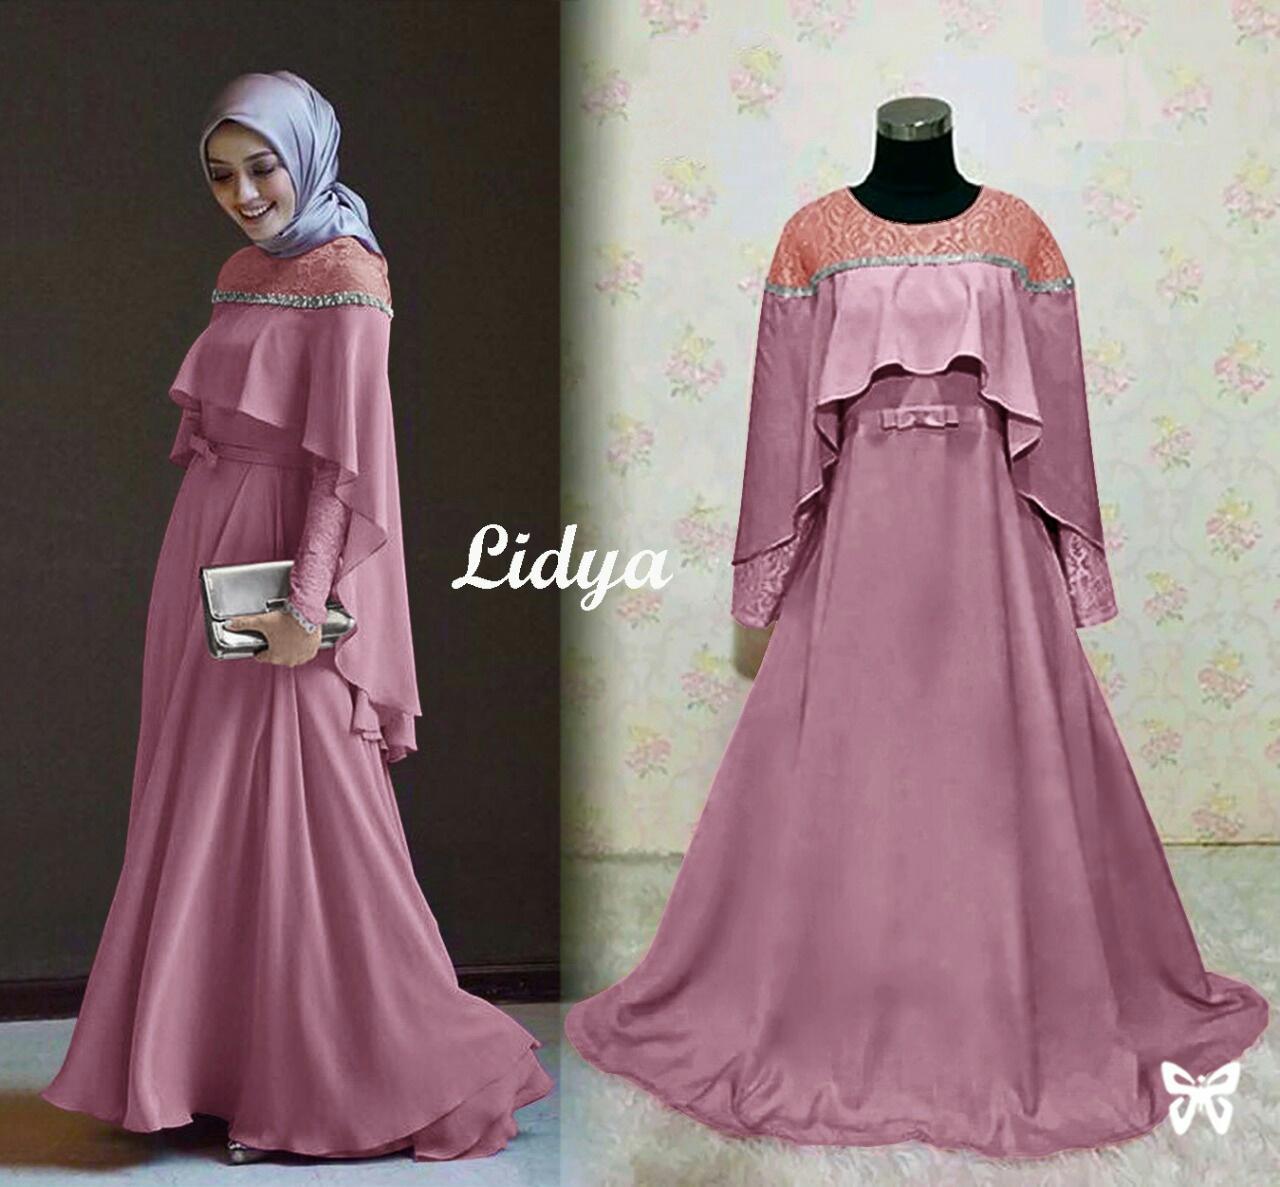 Solok Selatan Collection - Dress Pesta Muslimah / Gamis Syari / Baju Muslim / Baju Pesta Muslimah / Baju Islami